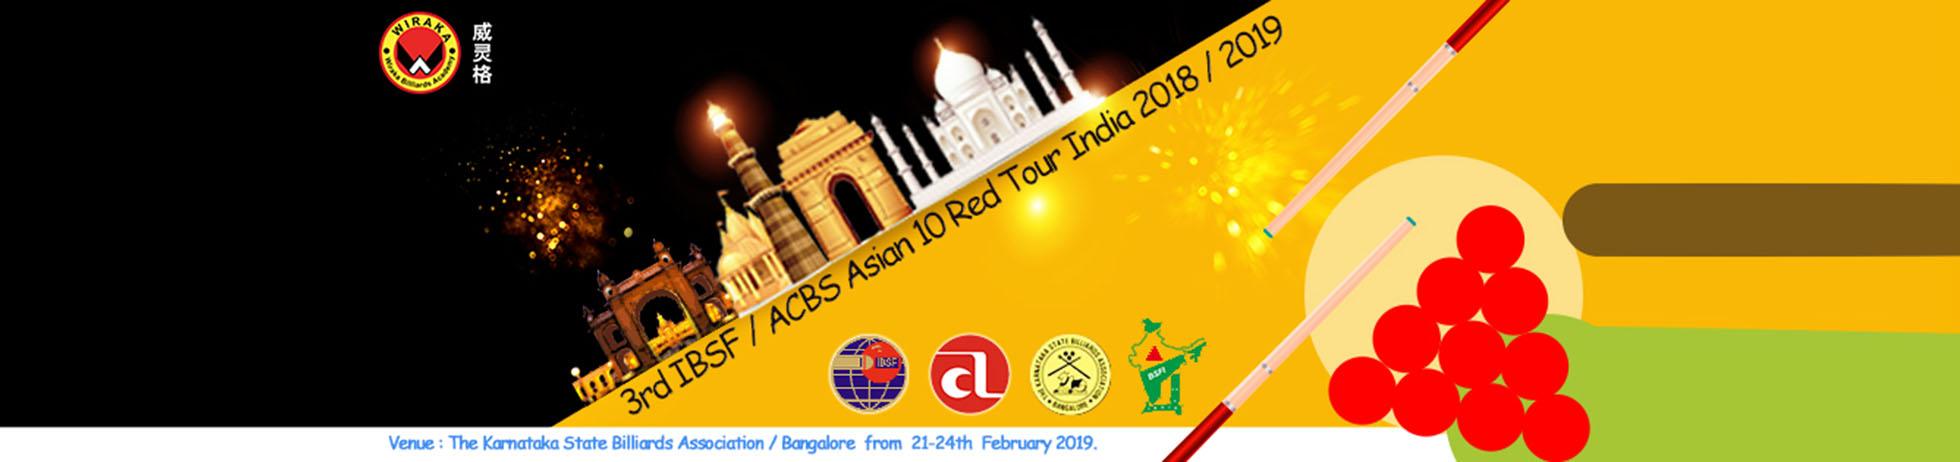 Asian-10-Red-Tour-India-2018